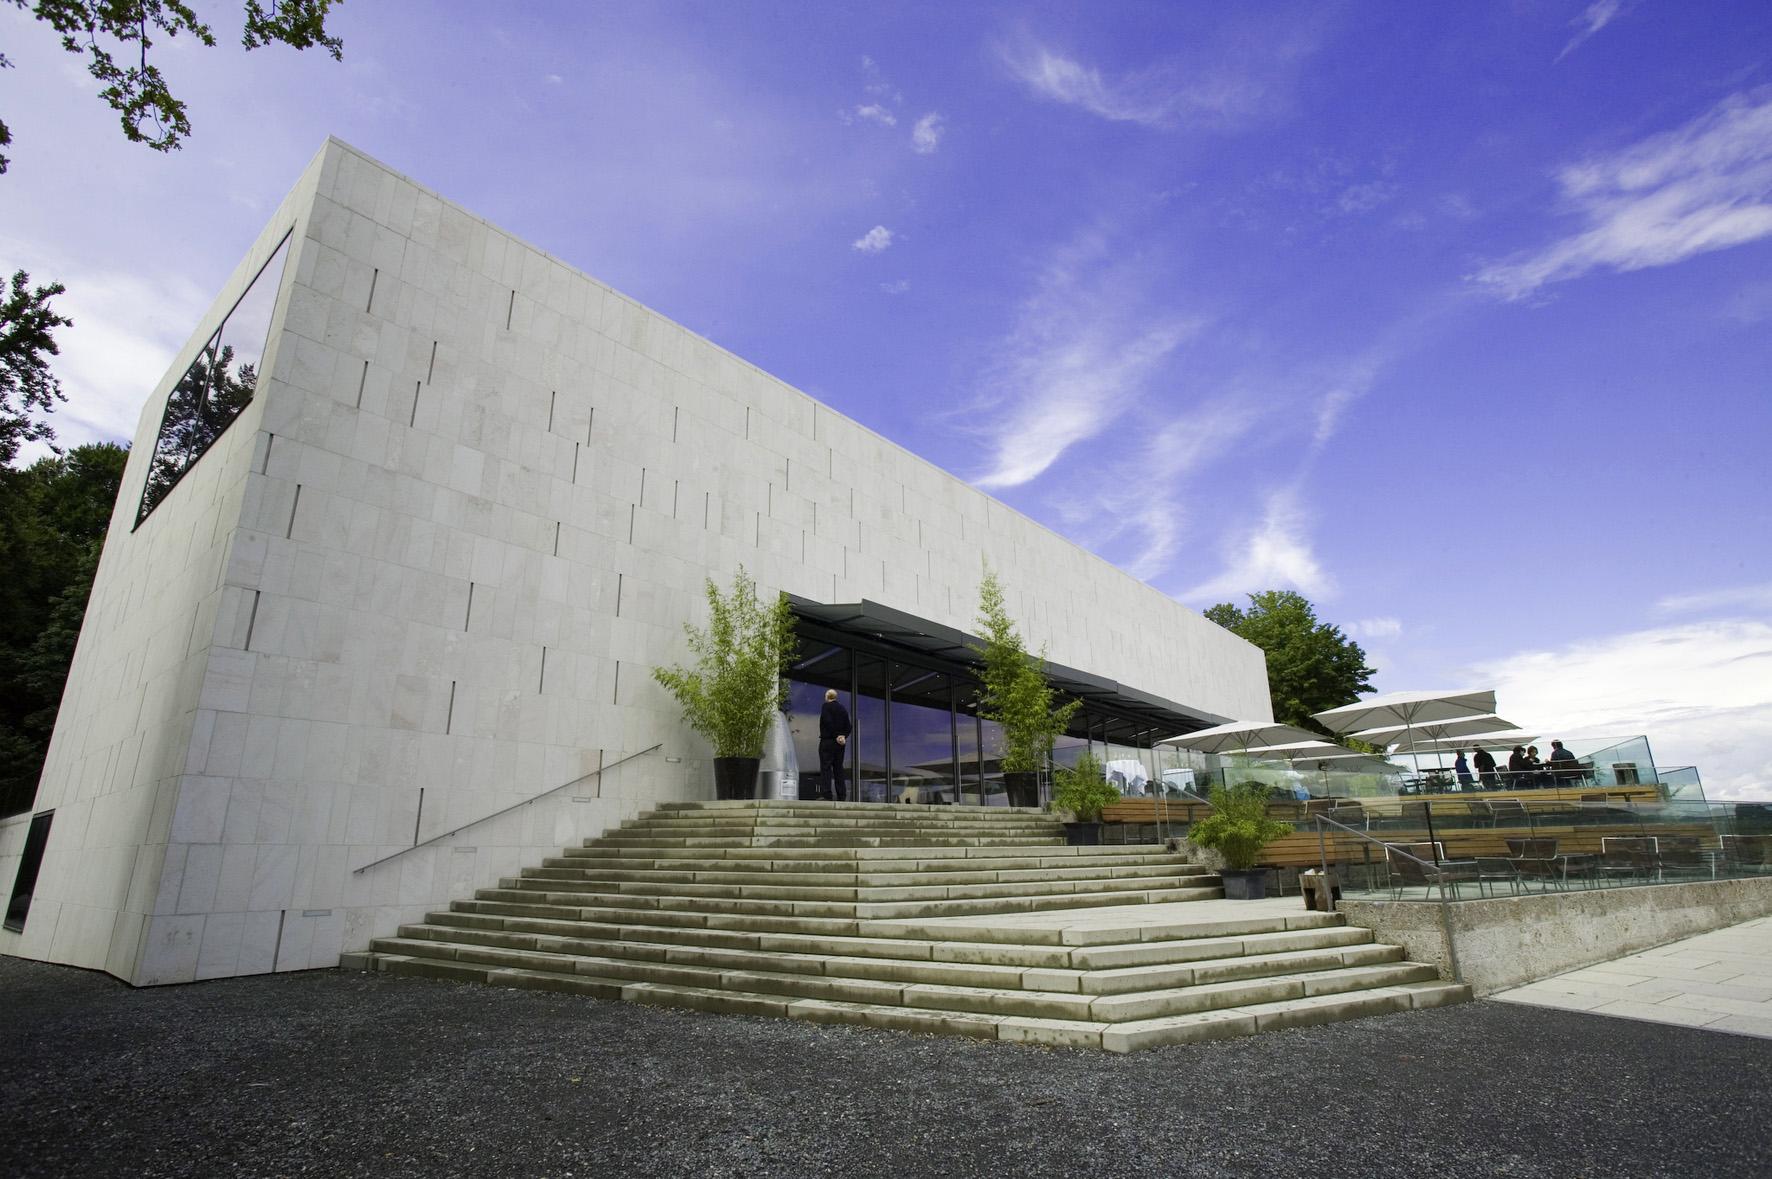 salzburg-muzeumi-der-moderne-ne-monschber-secret-world